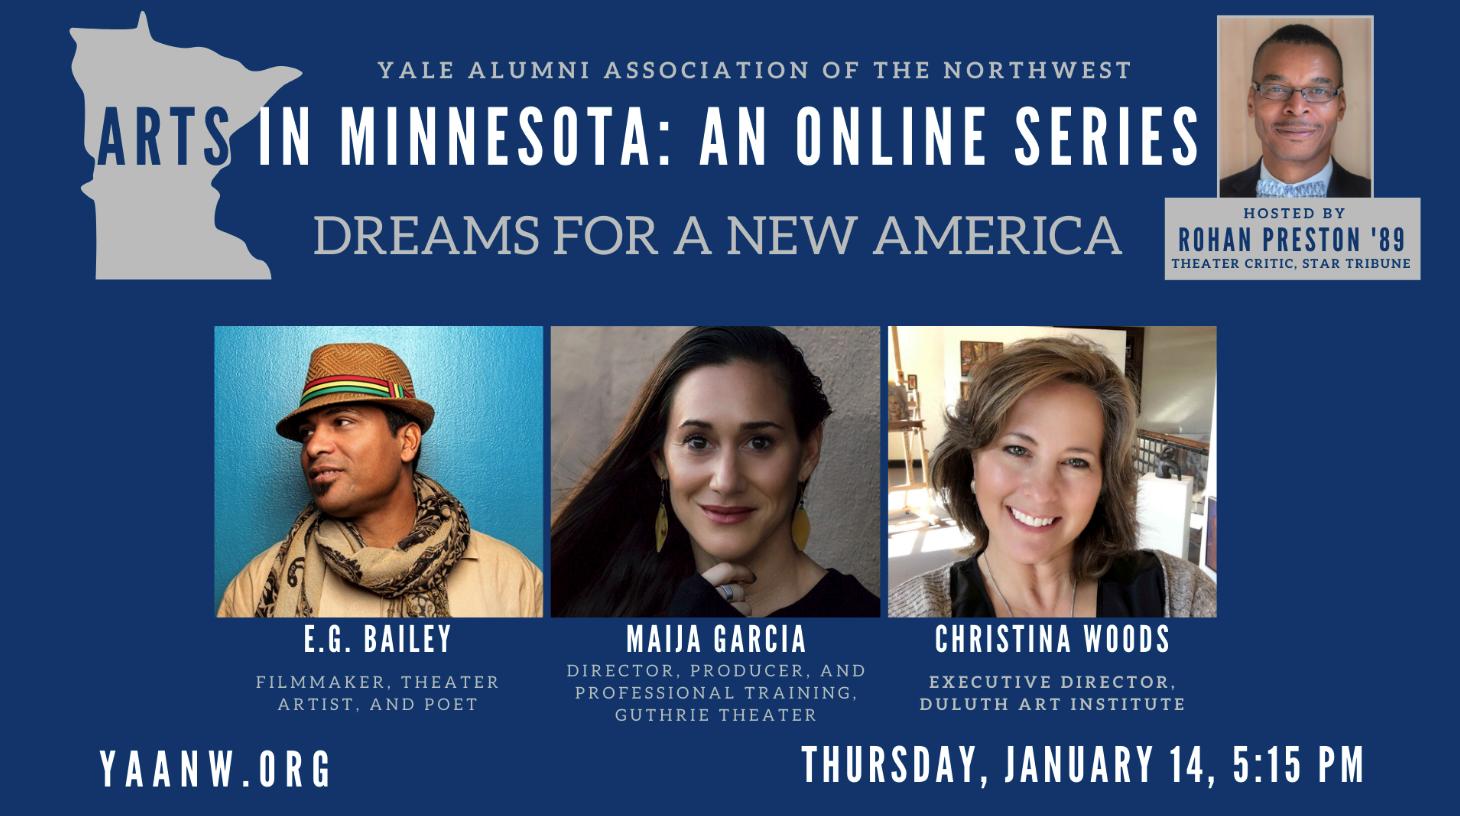 arts-in-minnesota-dreams-for-a-new-america